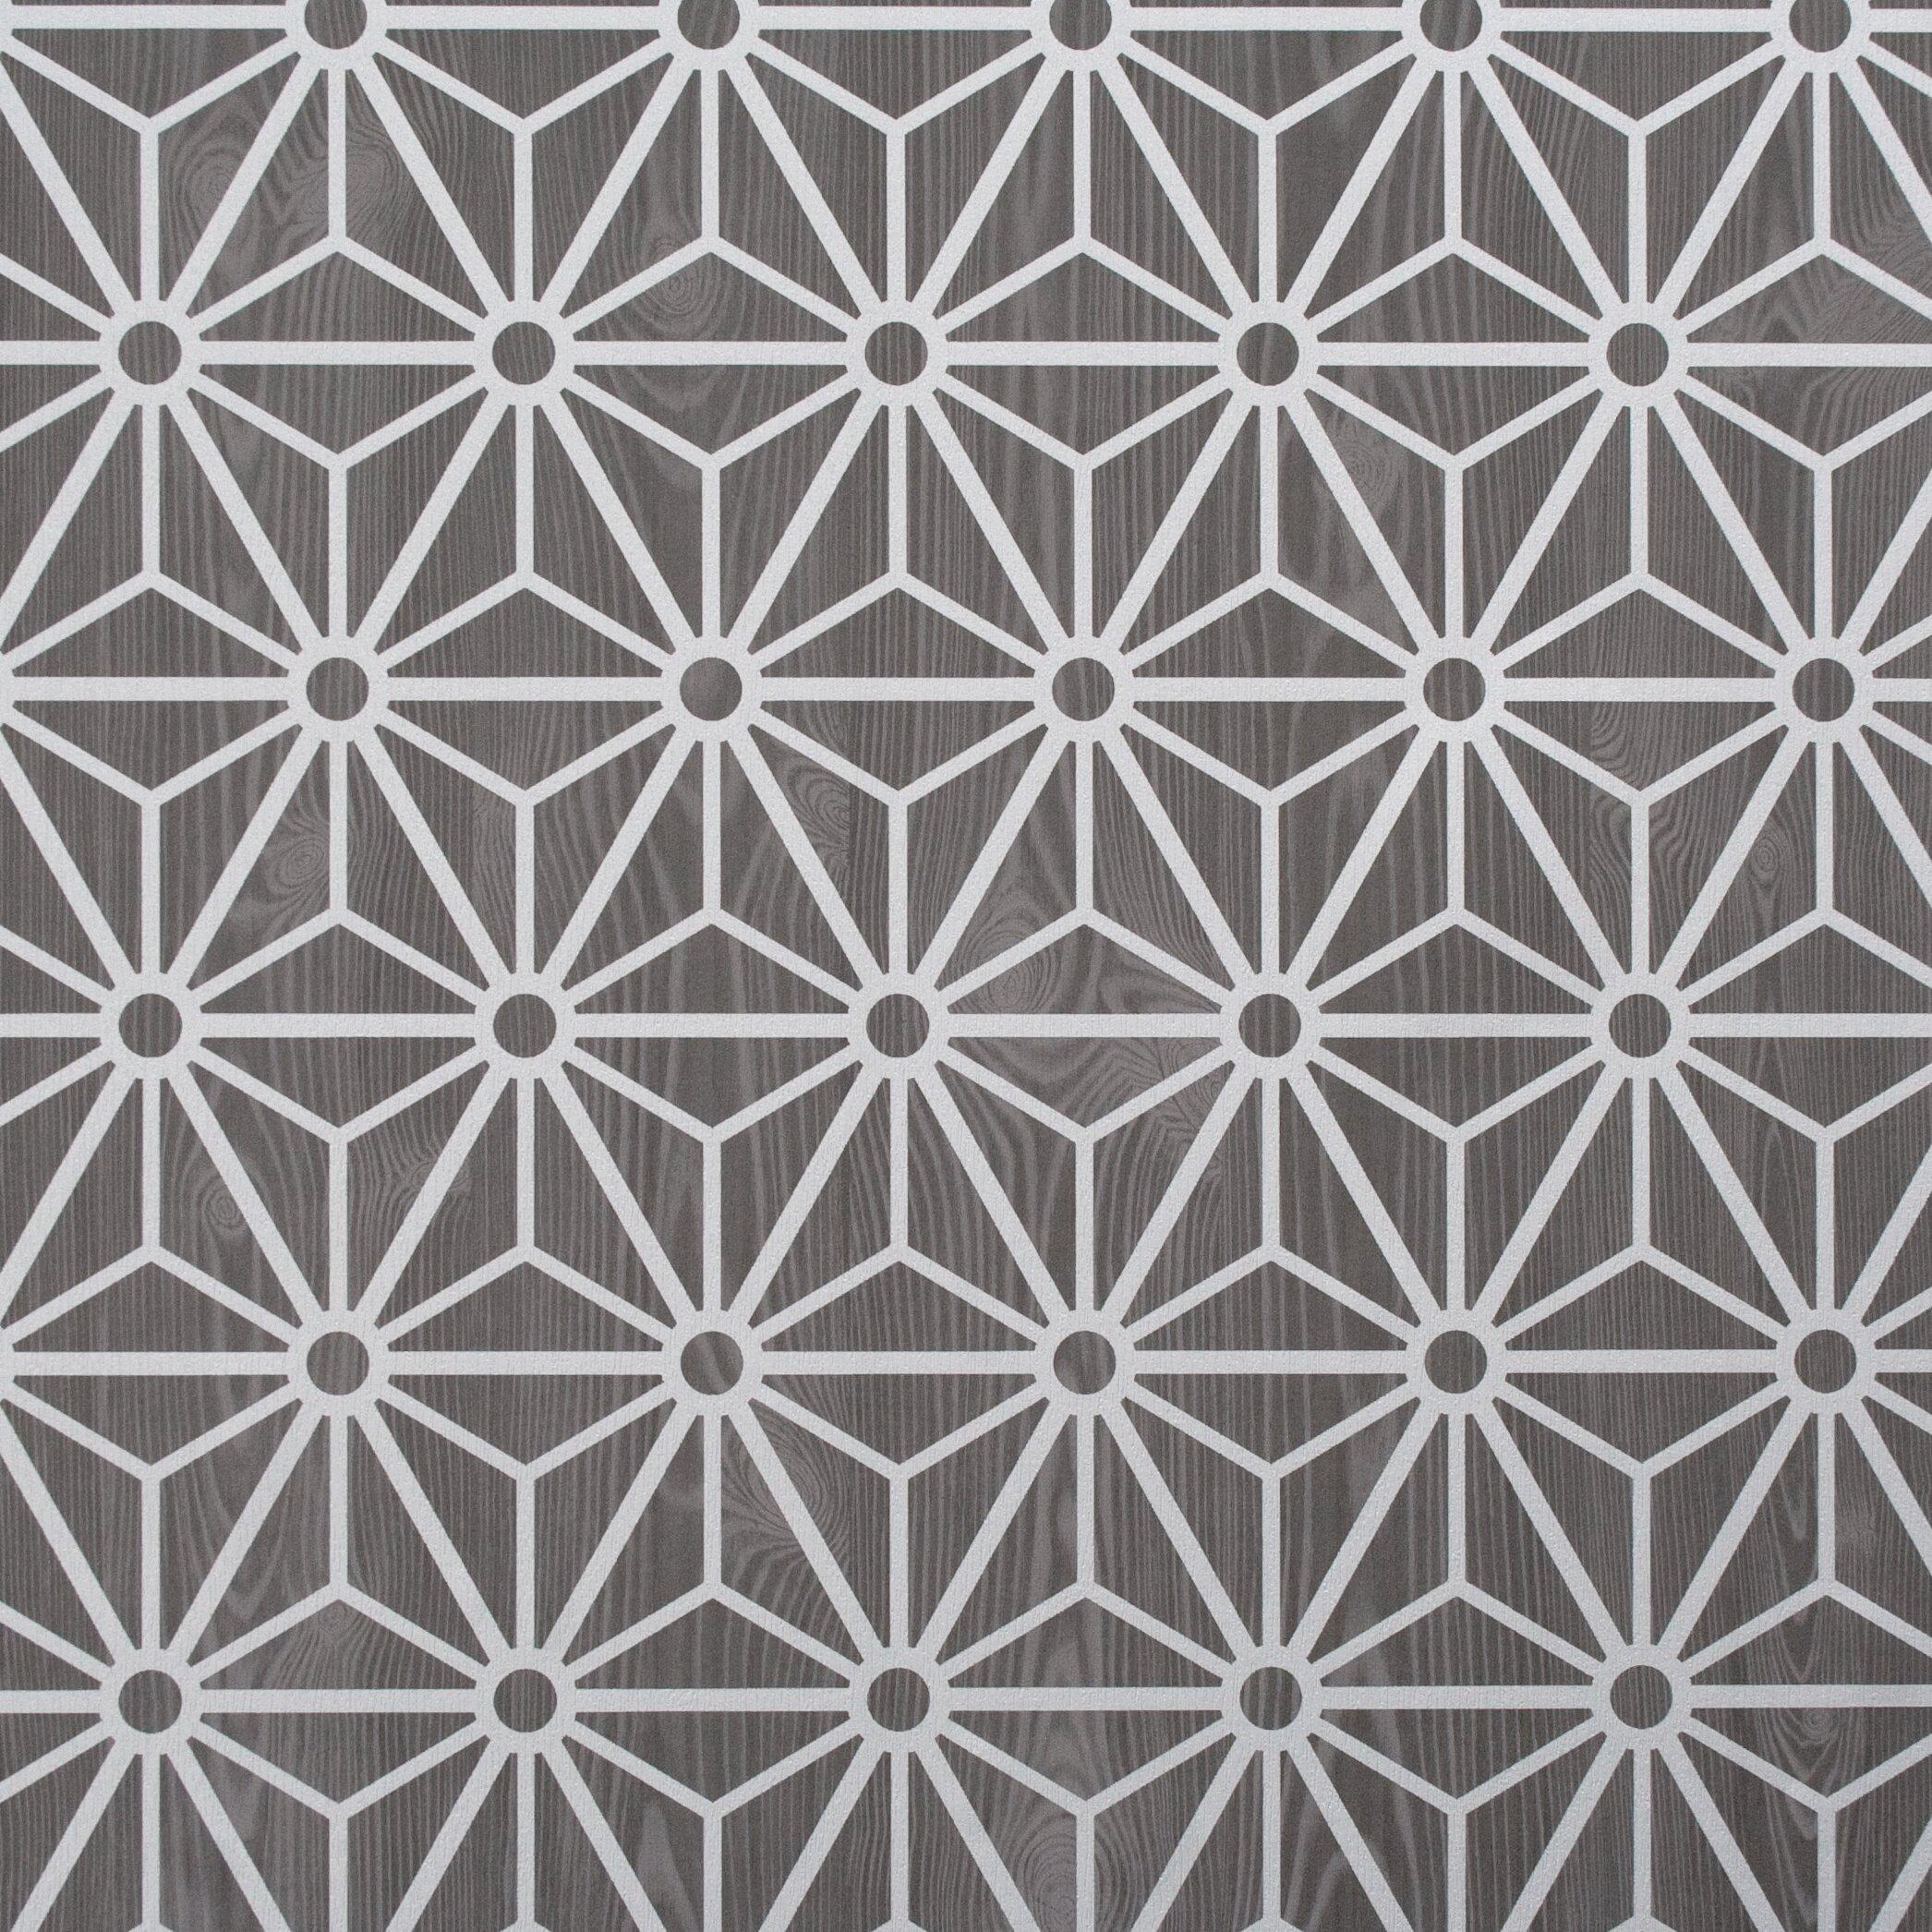 Walls Republic 33 x 208 Geometric Wallpaper & Reviews